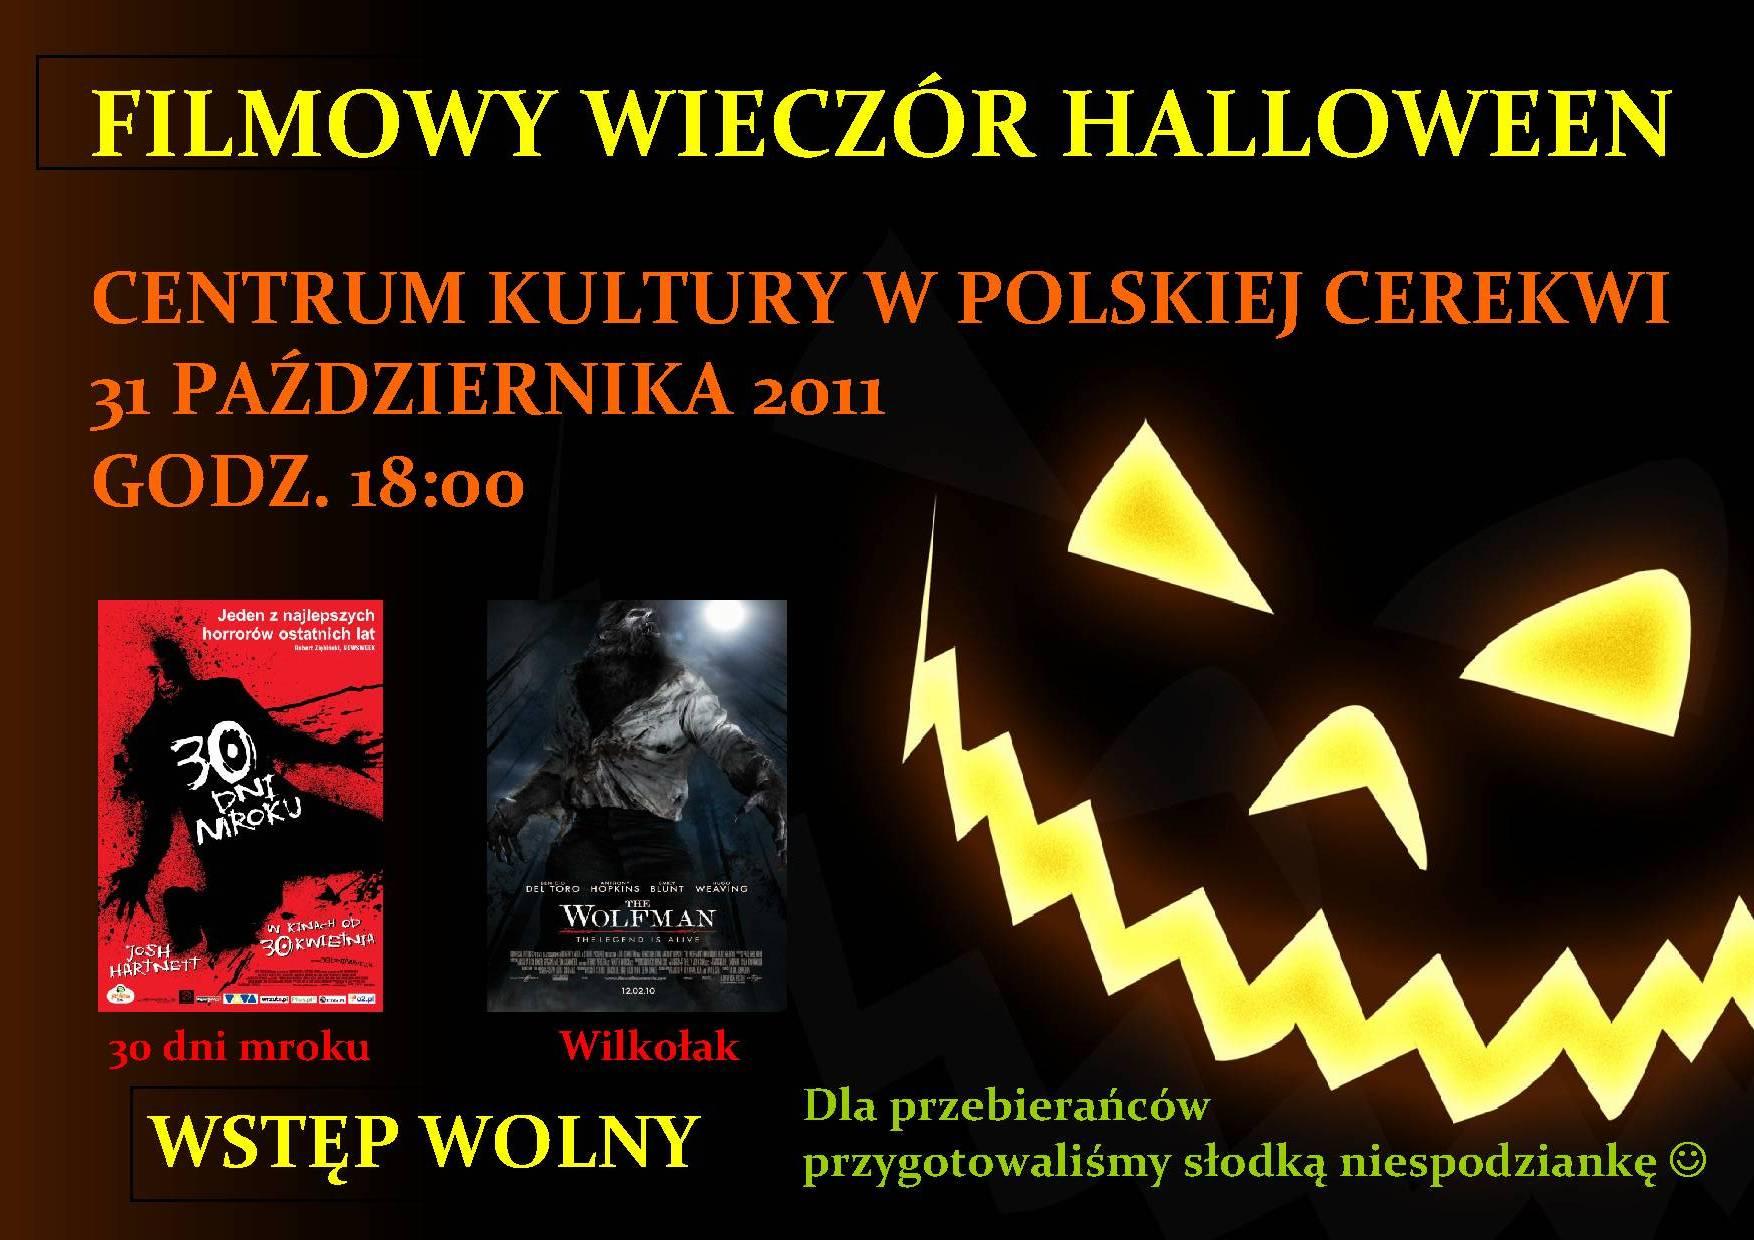 31.10.2011 - Halloween.jpeg